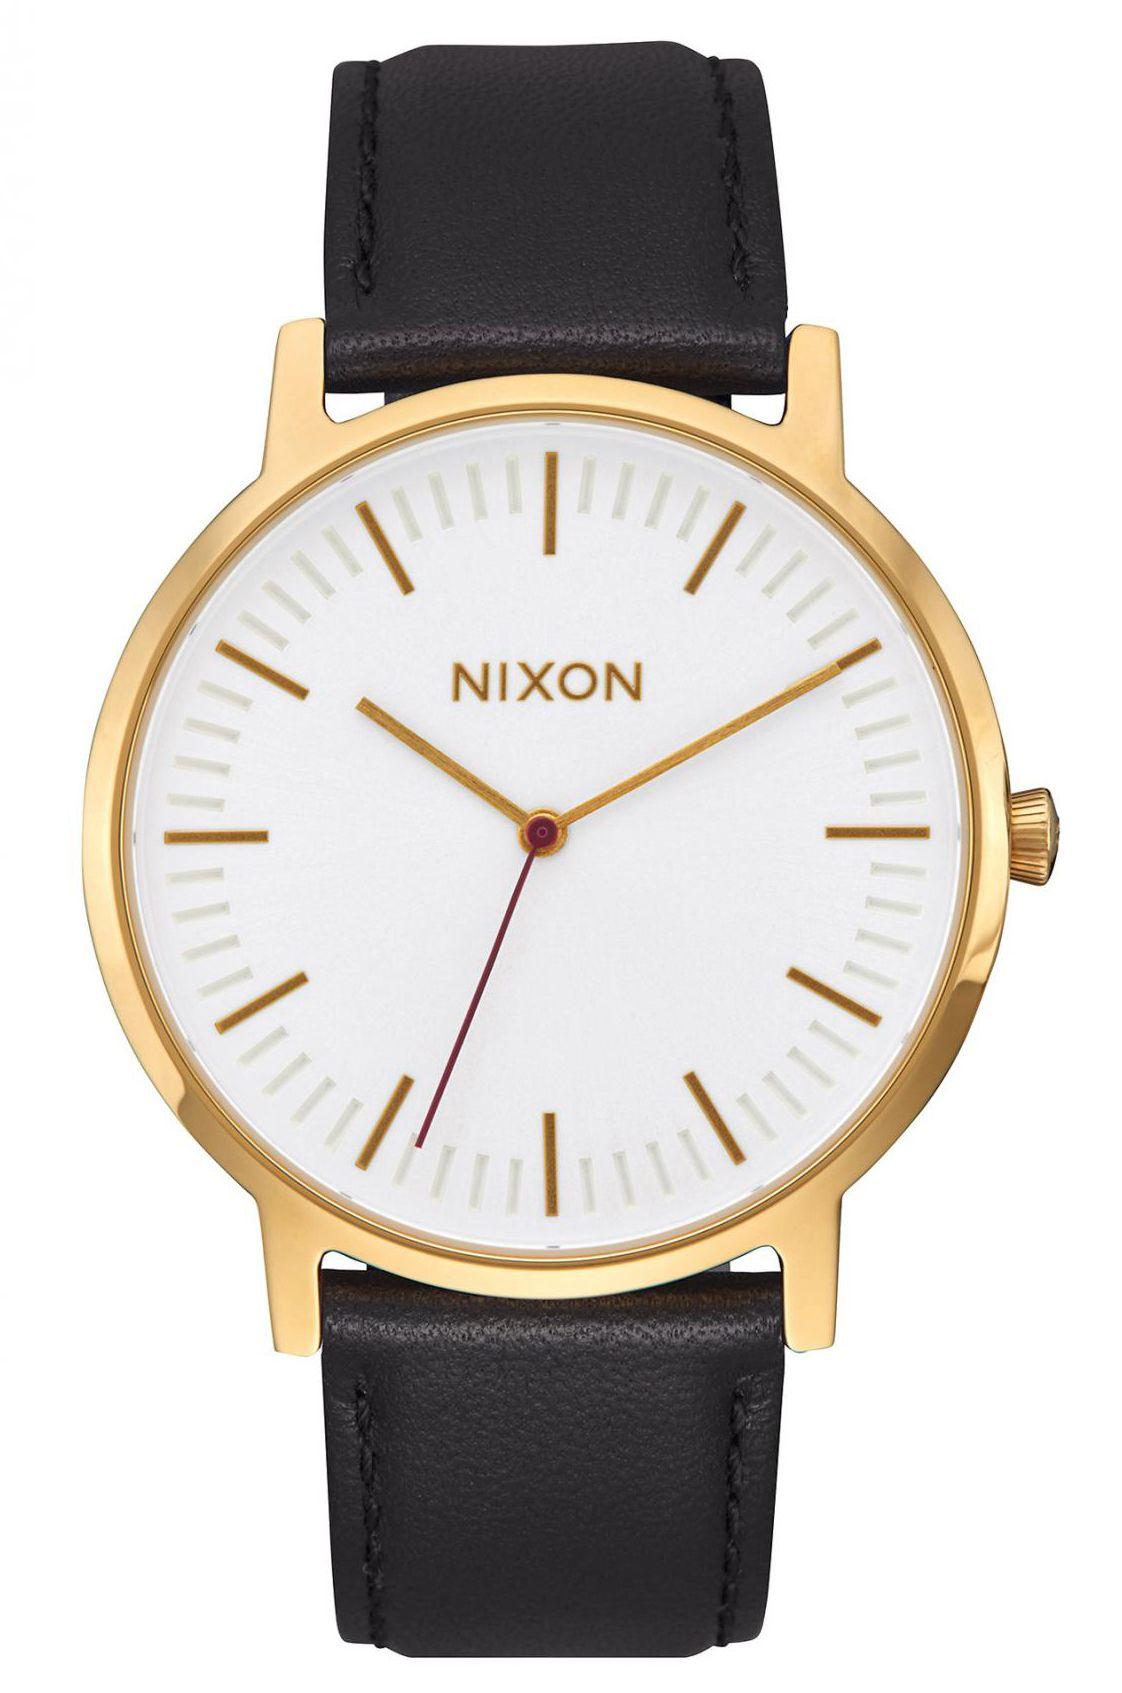 Nixon Watch PORTER PACK Gold/Black/Navy